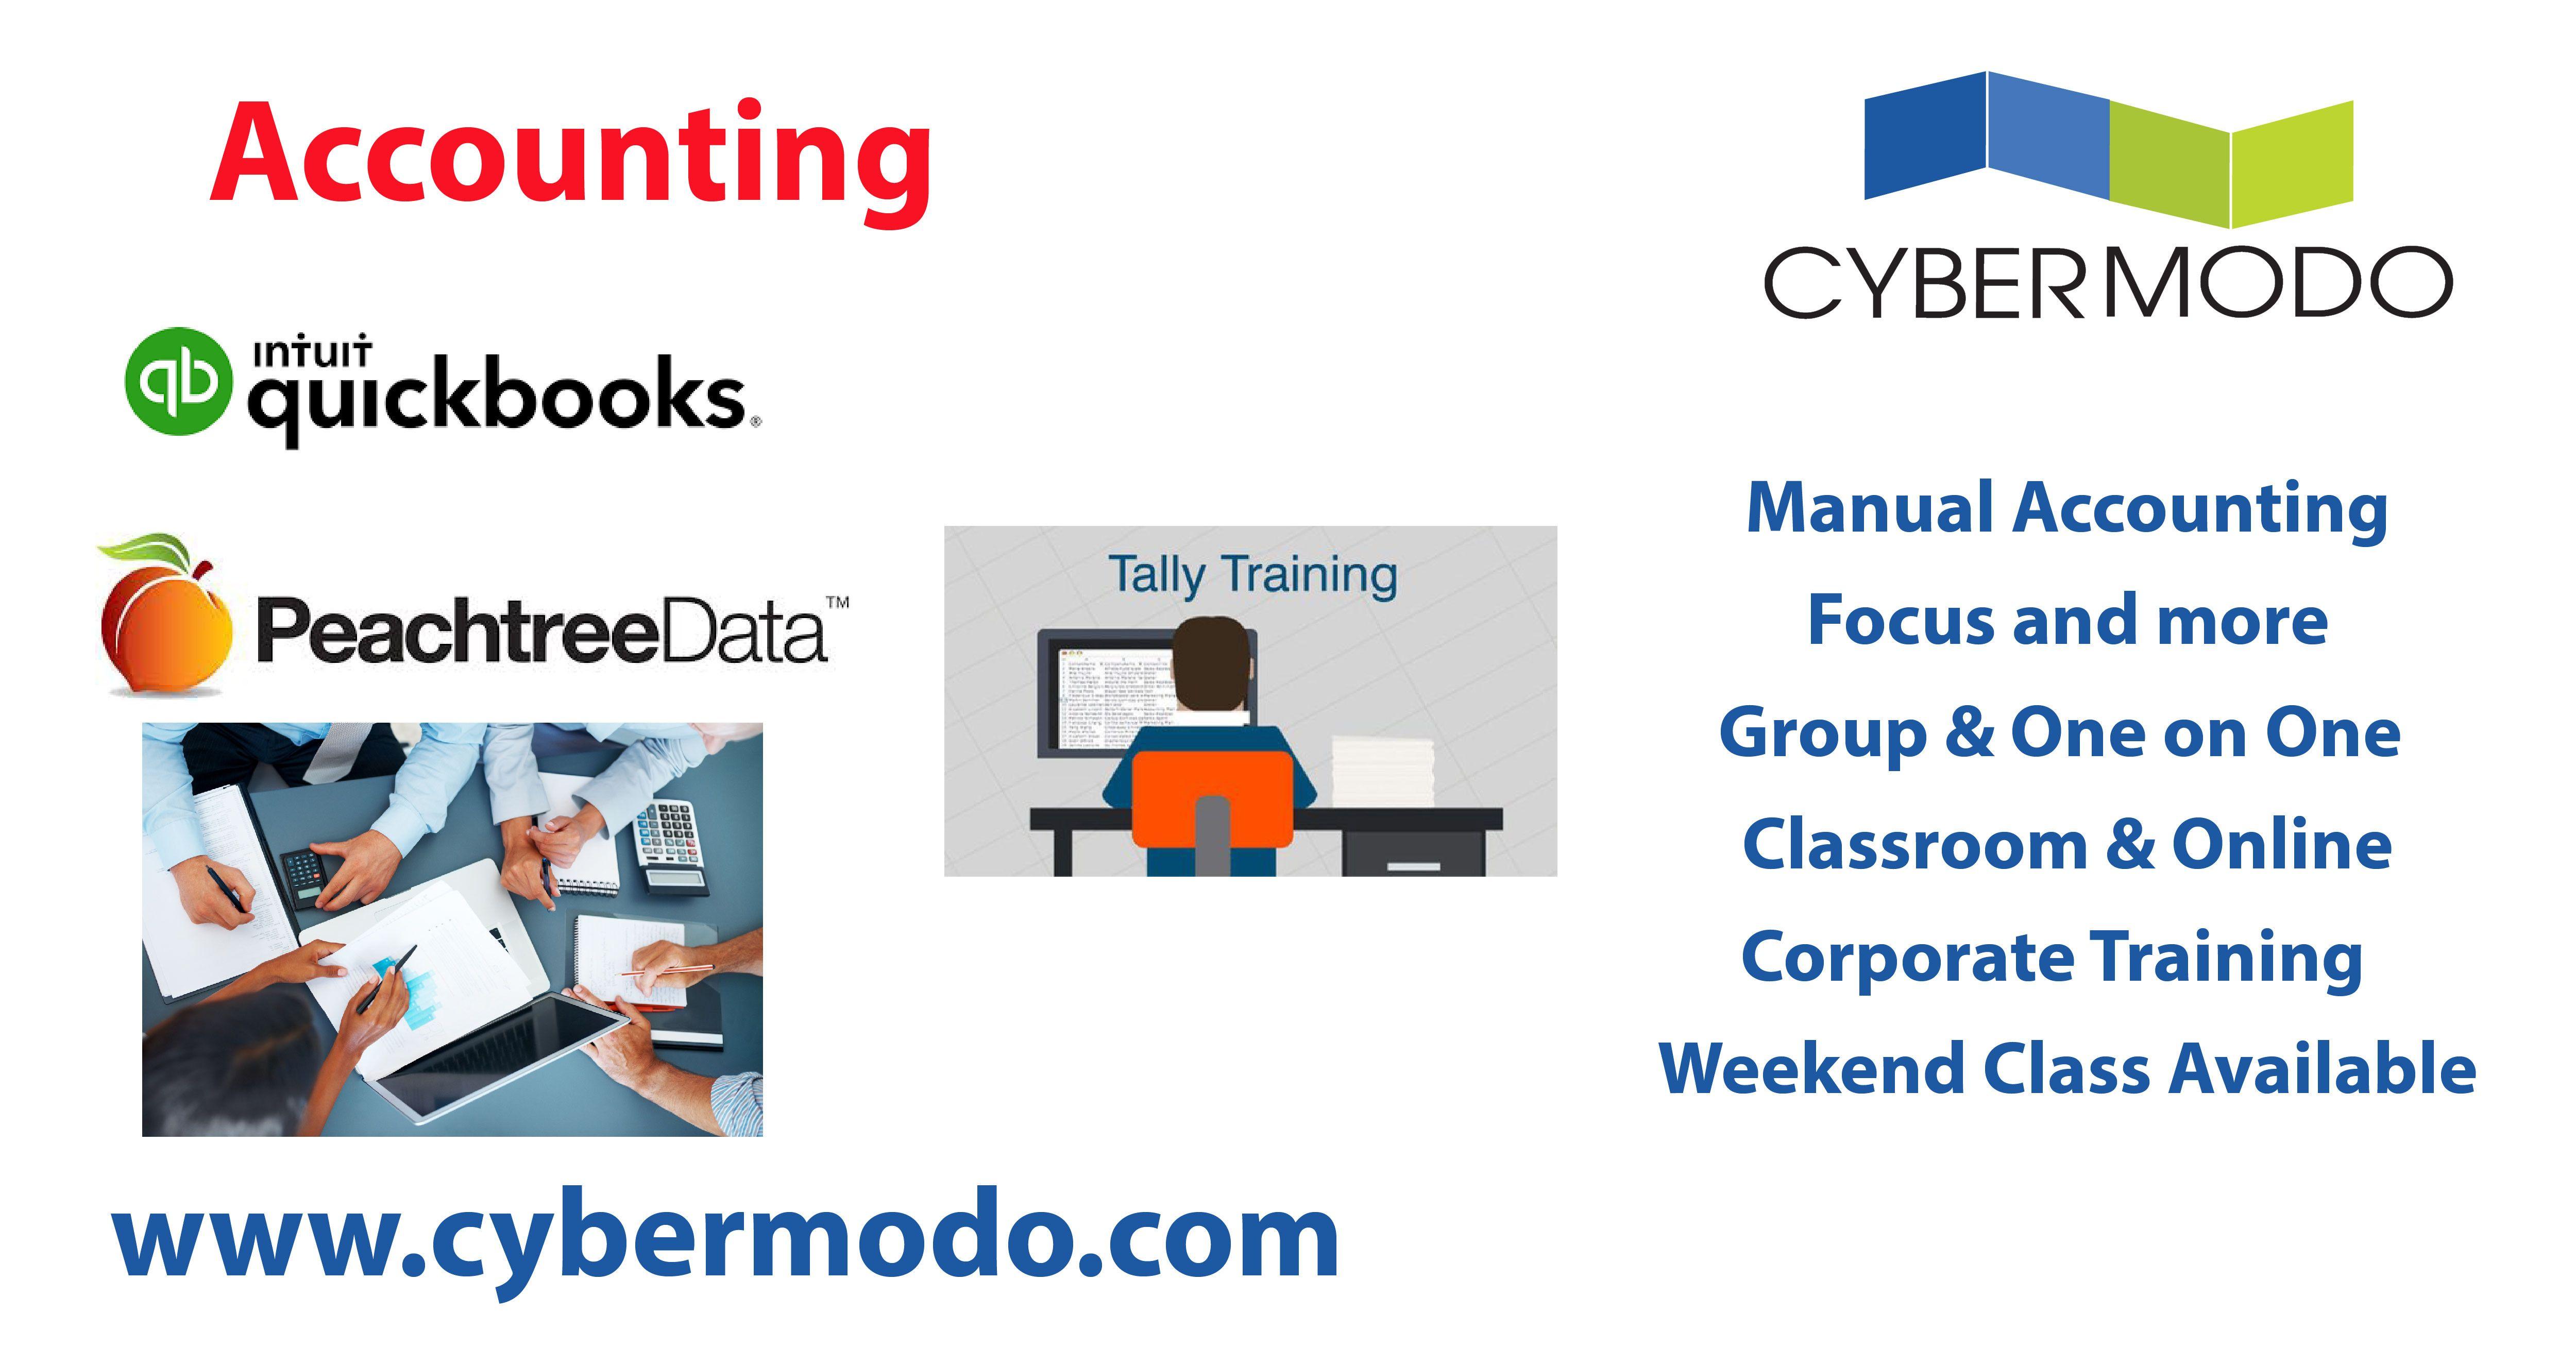 Cyber Modo Solutions 27